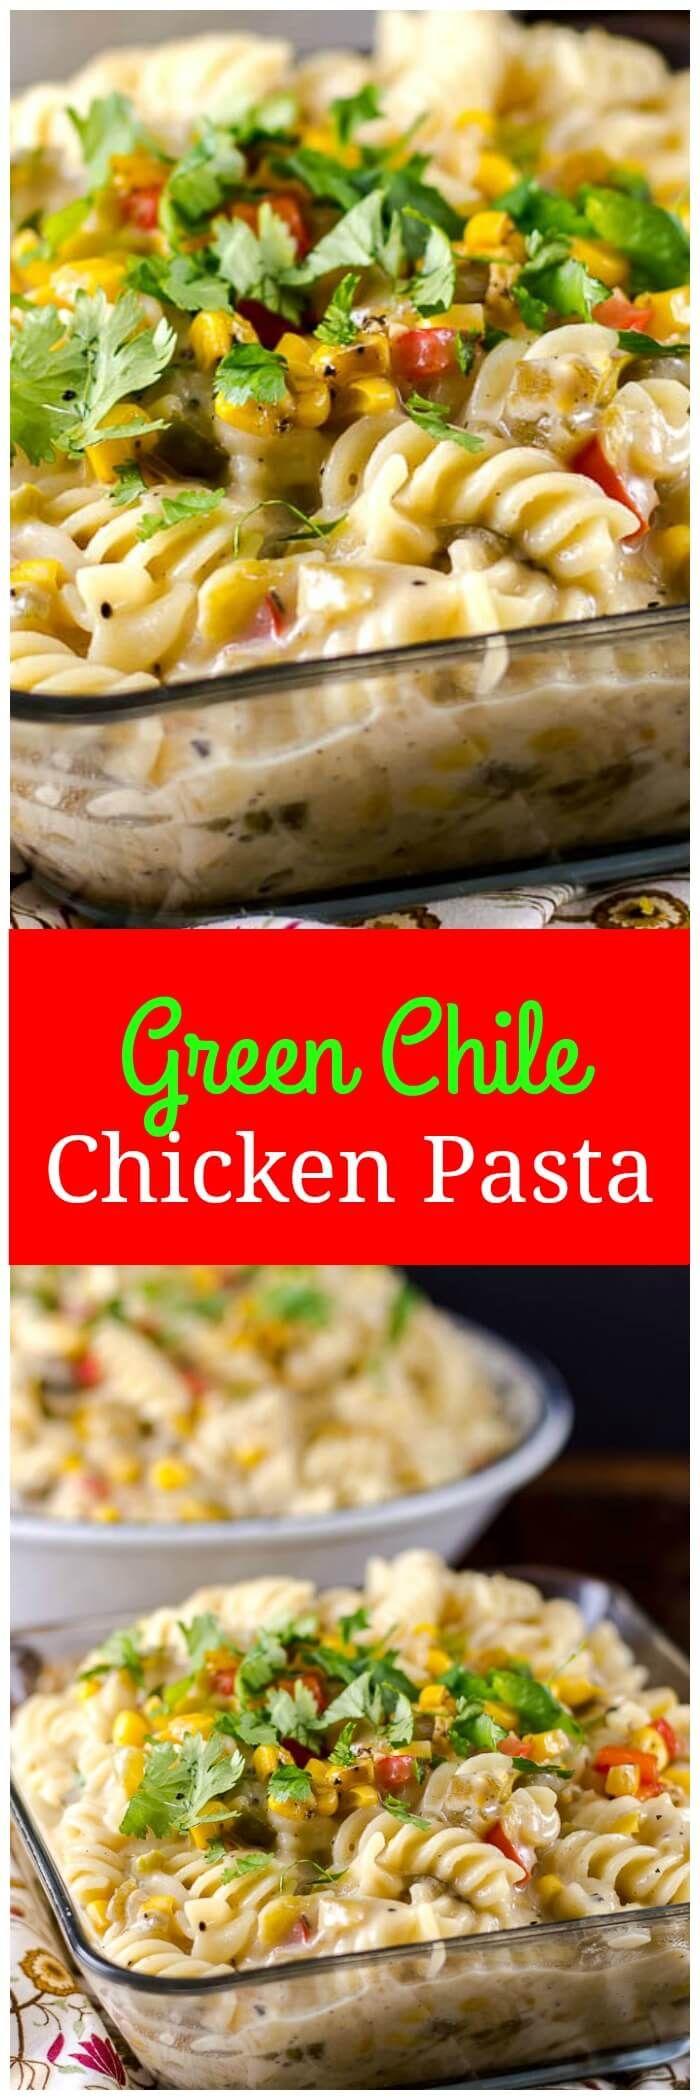 This Green Chile Chicken Pasta is a rich and creamy Southwest style pasta dish. @nutriendotuvida  #MyExceptionalPasta #GoldenHarvest #Pmedia #ad via @flavormosaic